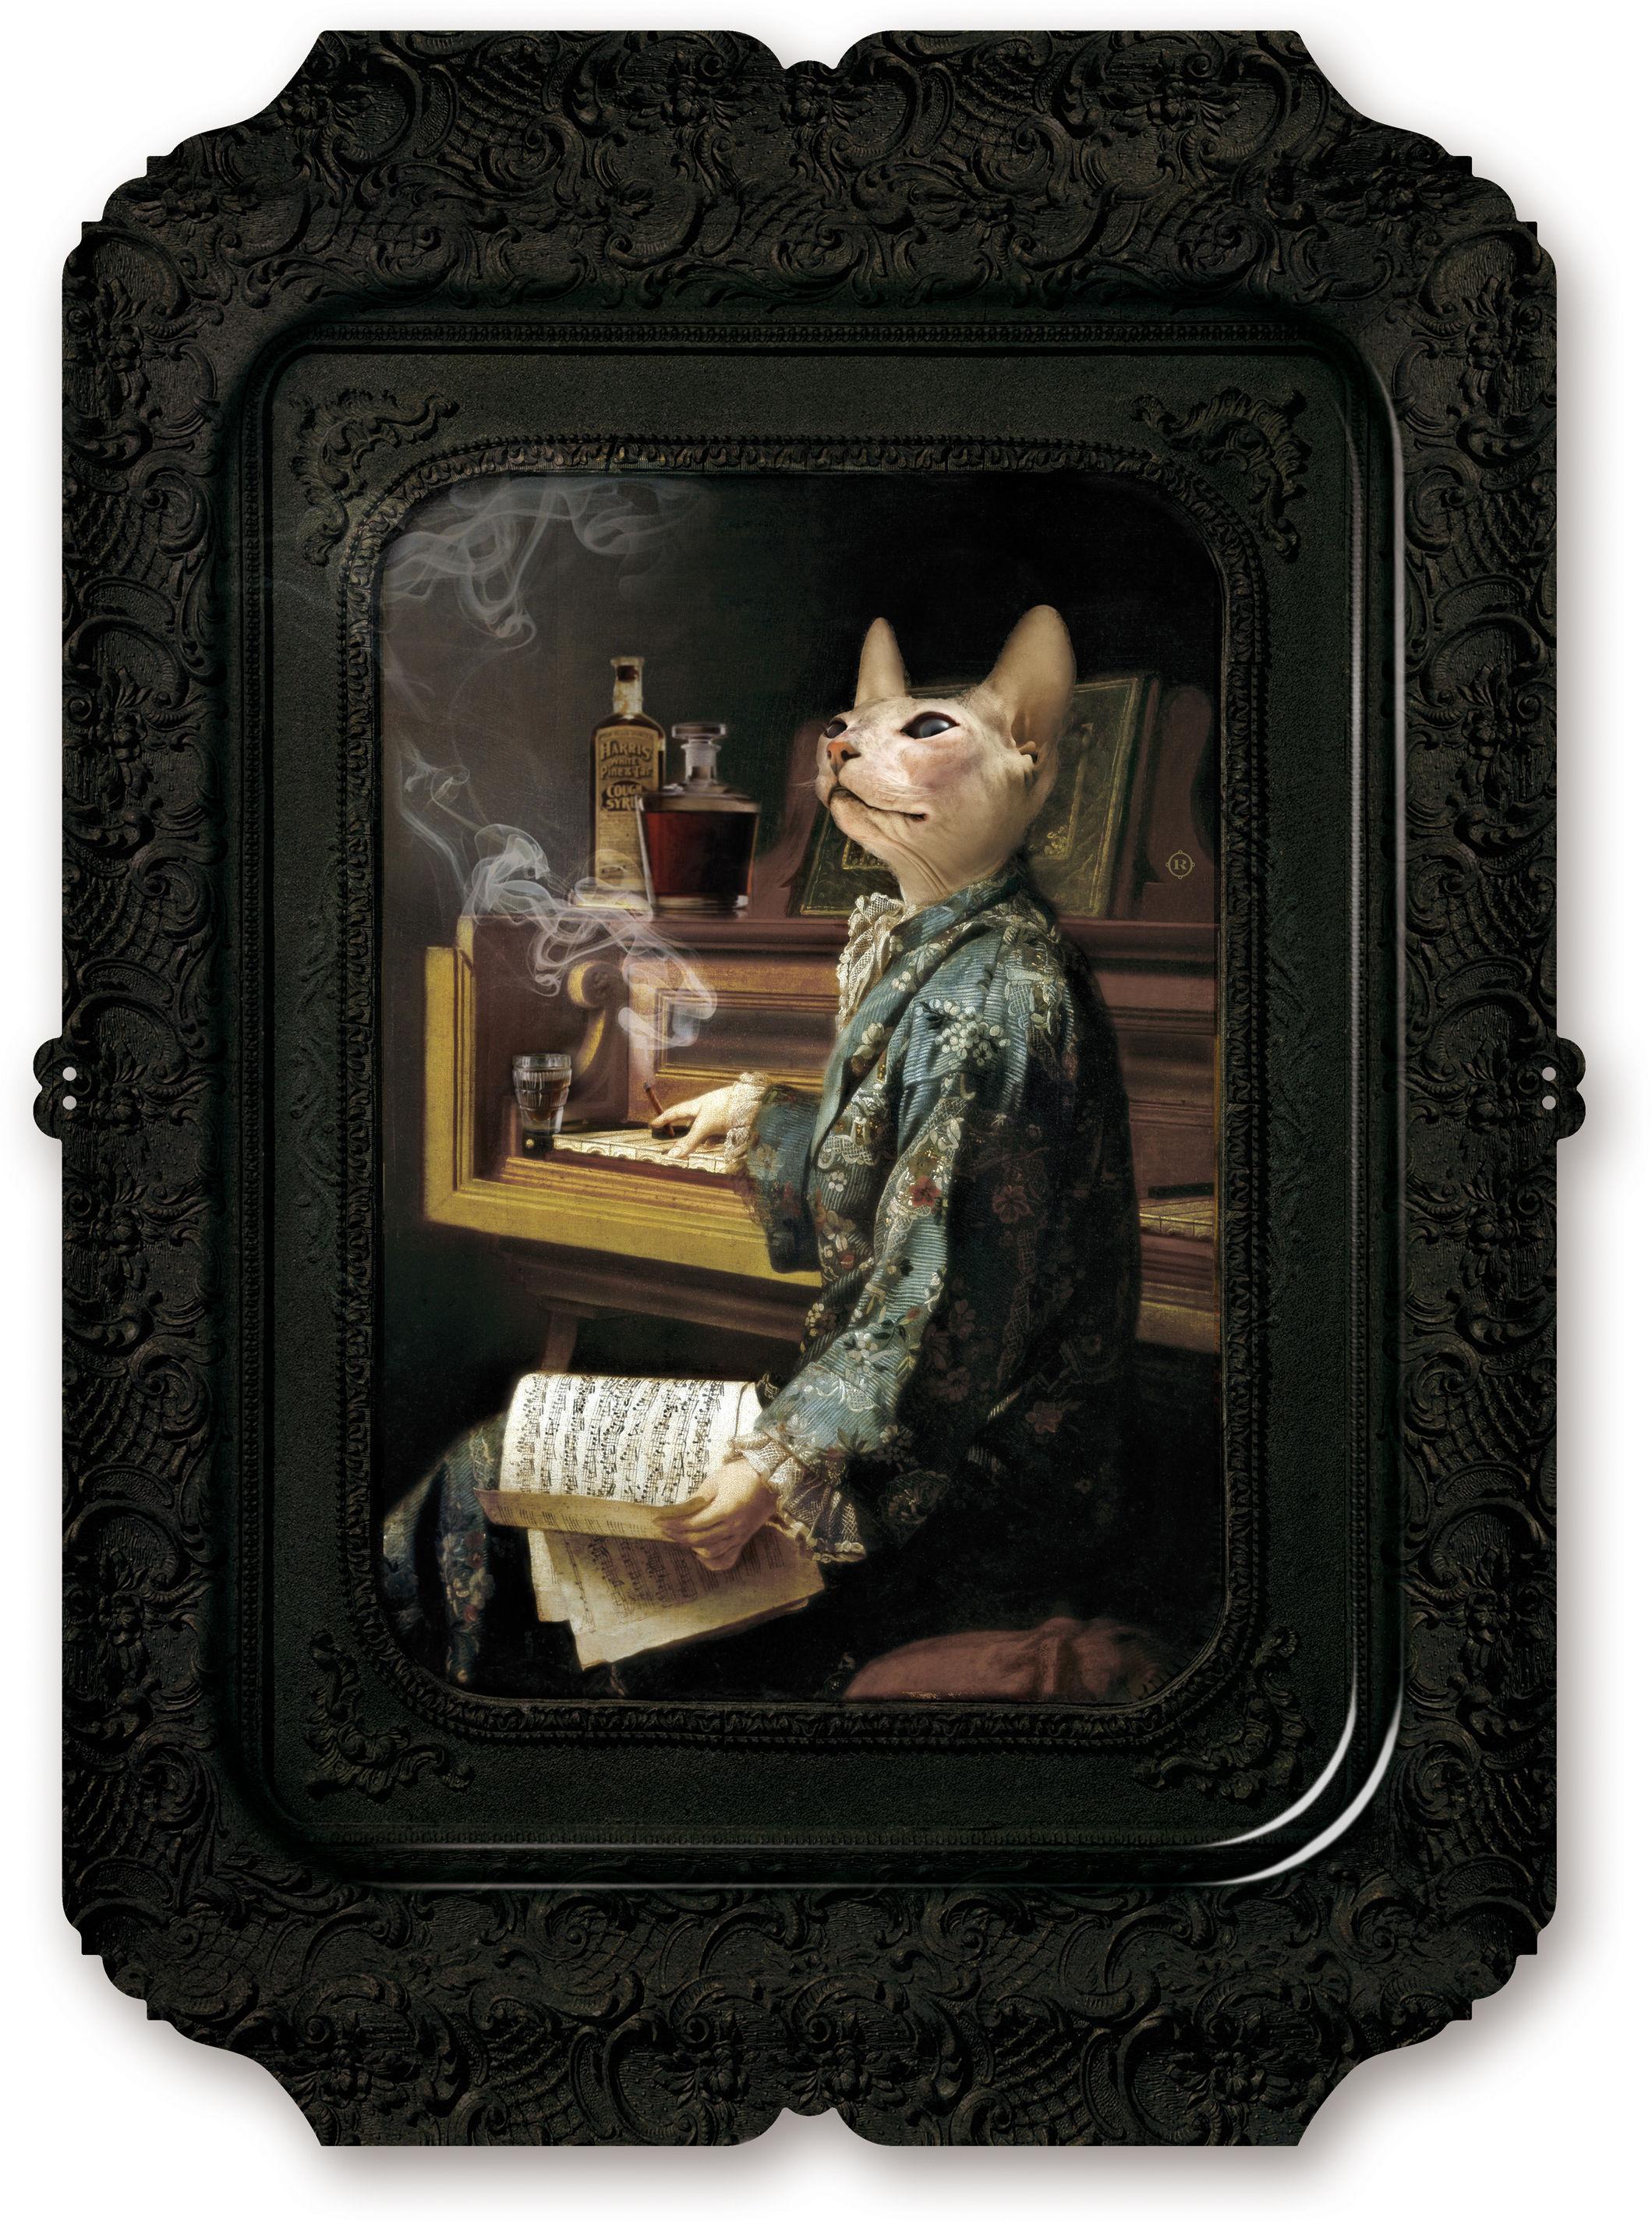 Tischkultur - Tabletts - Visconti Lazy Victoire Tablett / Bild - H 45 cm - Ibride - Mehrfarbig - massive Press-Spanplatte